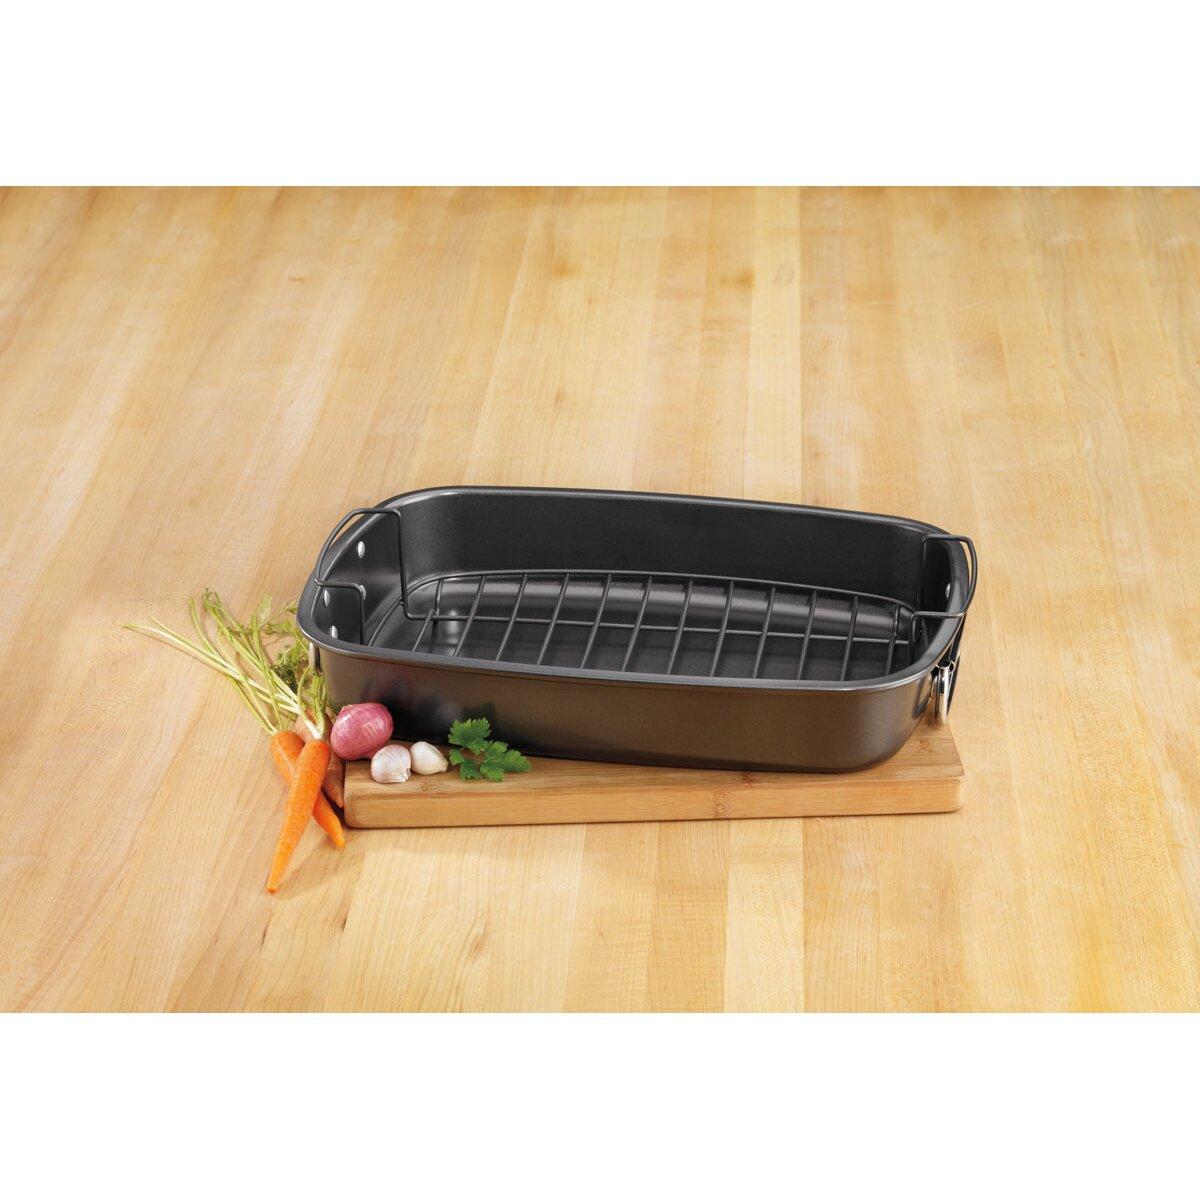 cuisinart 17 carbon steel non stick roaster pan with rack reviews wayfair. Black Bedroom Furniture Sets. Home Design Ideas